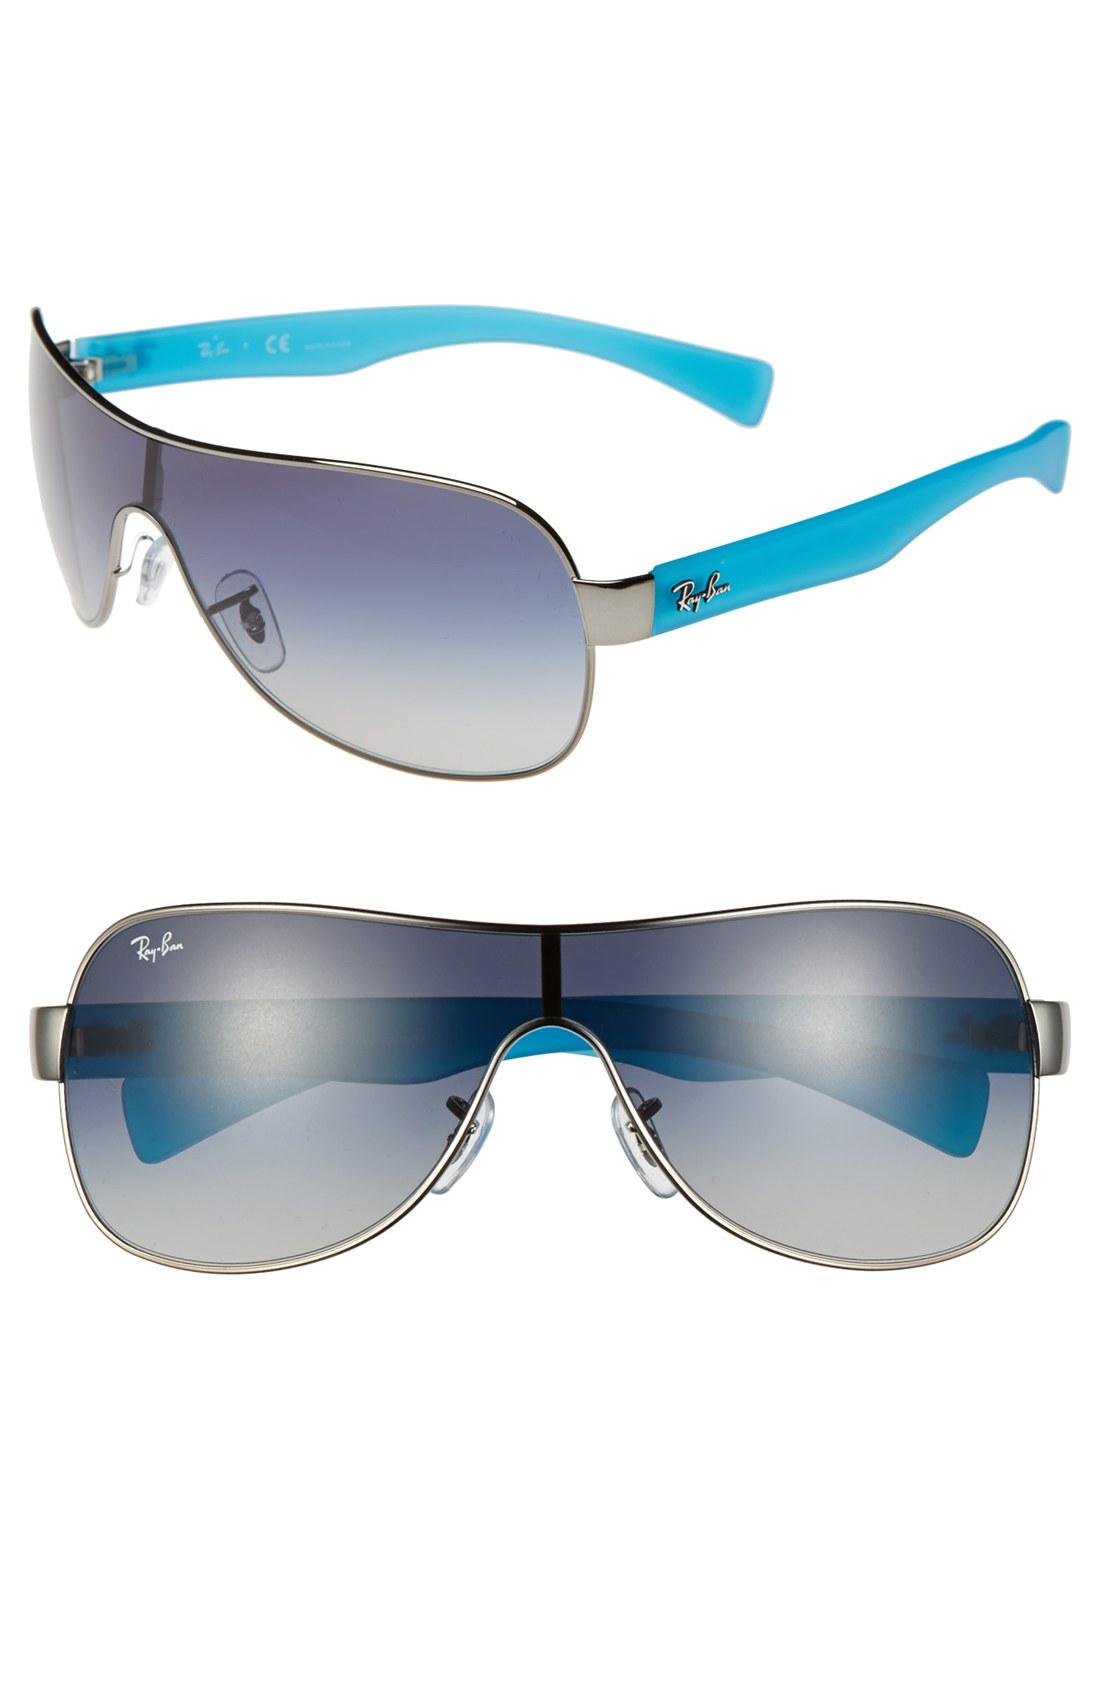 55e9fab86b8 Ray Ban Metal Shield Sunglasses « Heritage Malta